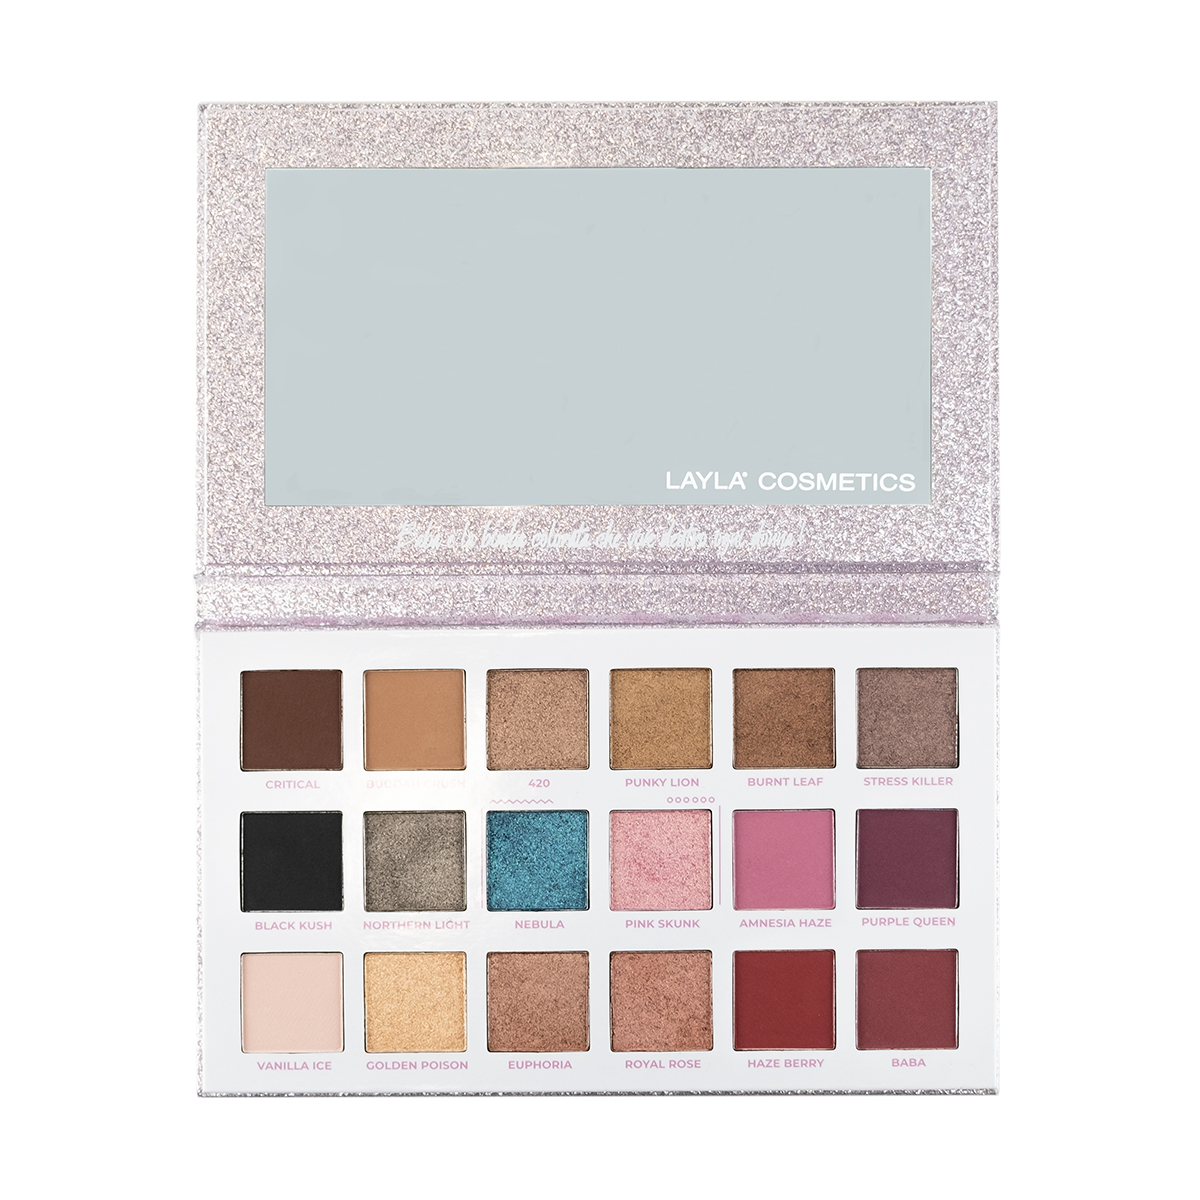 layla cosmetics palette baba